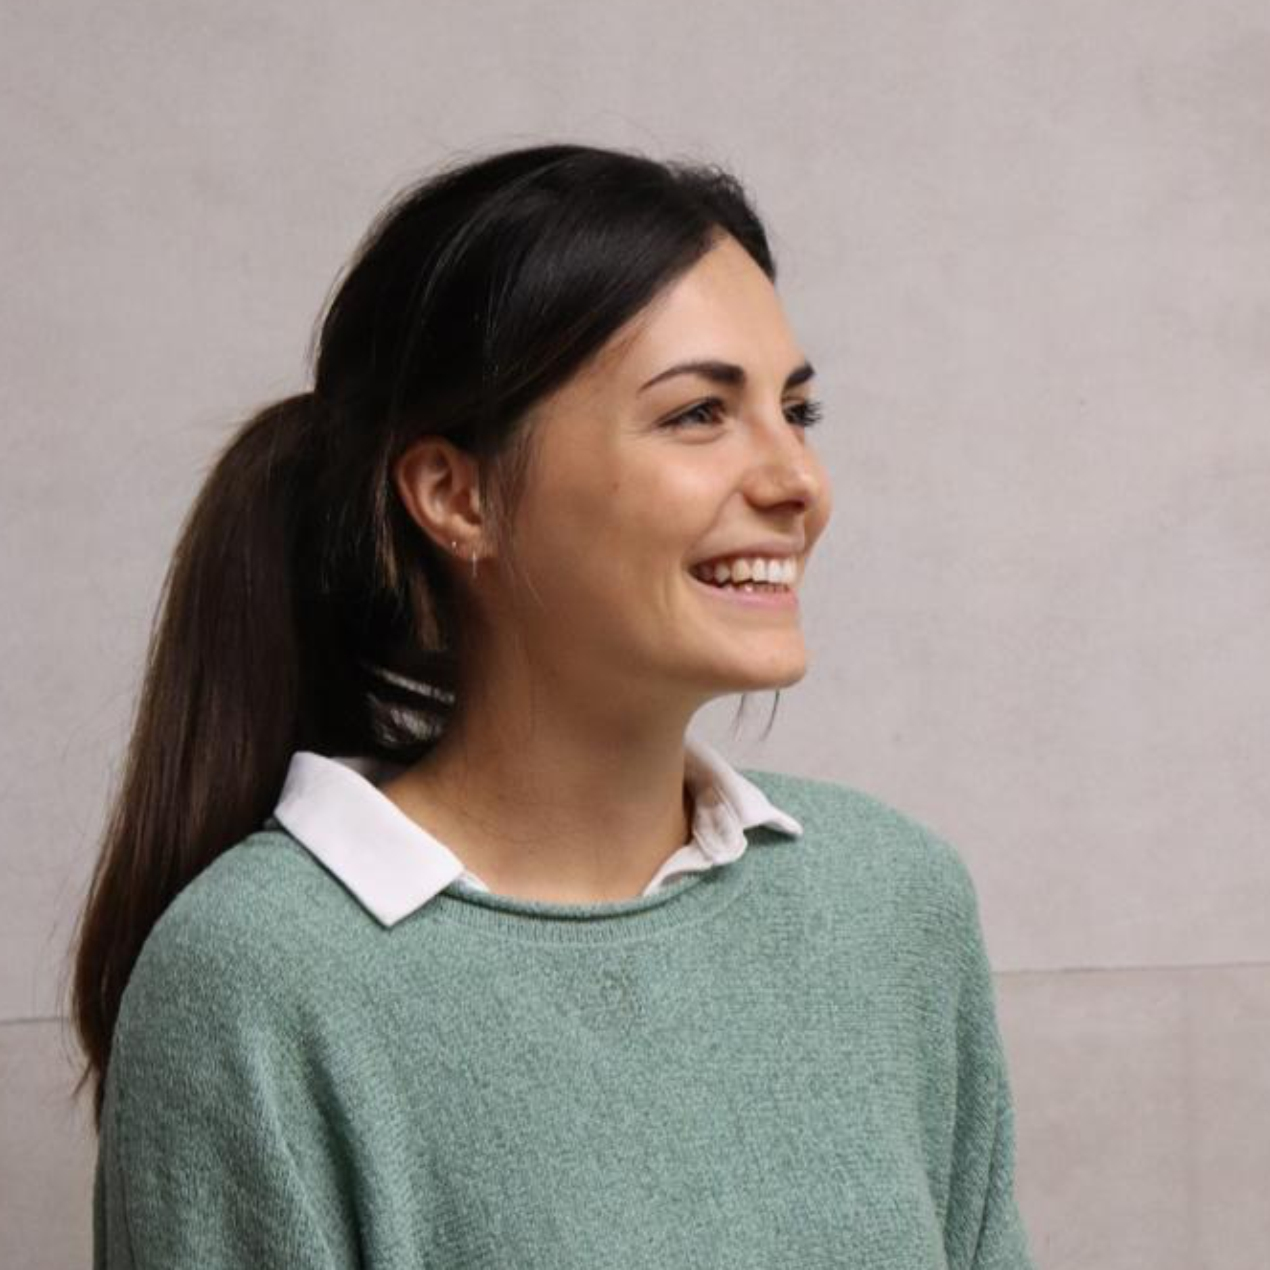 Sara Miljic